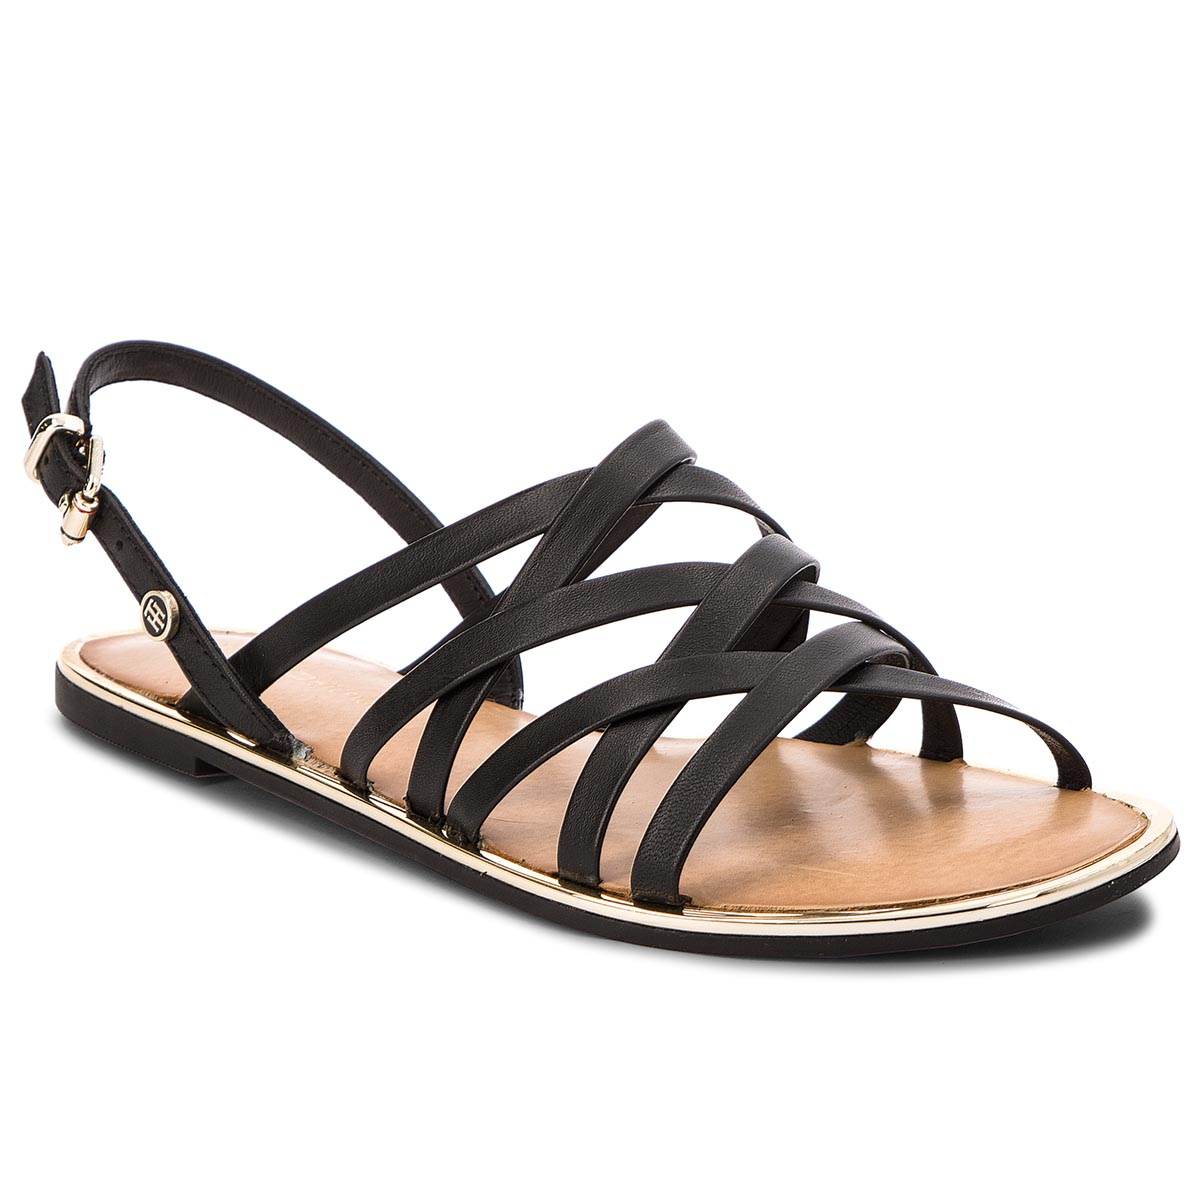 Sandále TOMMY HILFIGER - Leather Strappy Flat Sandal FW0FW02228 Black 990